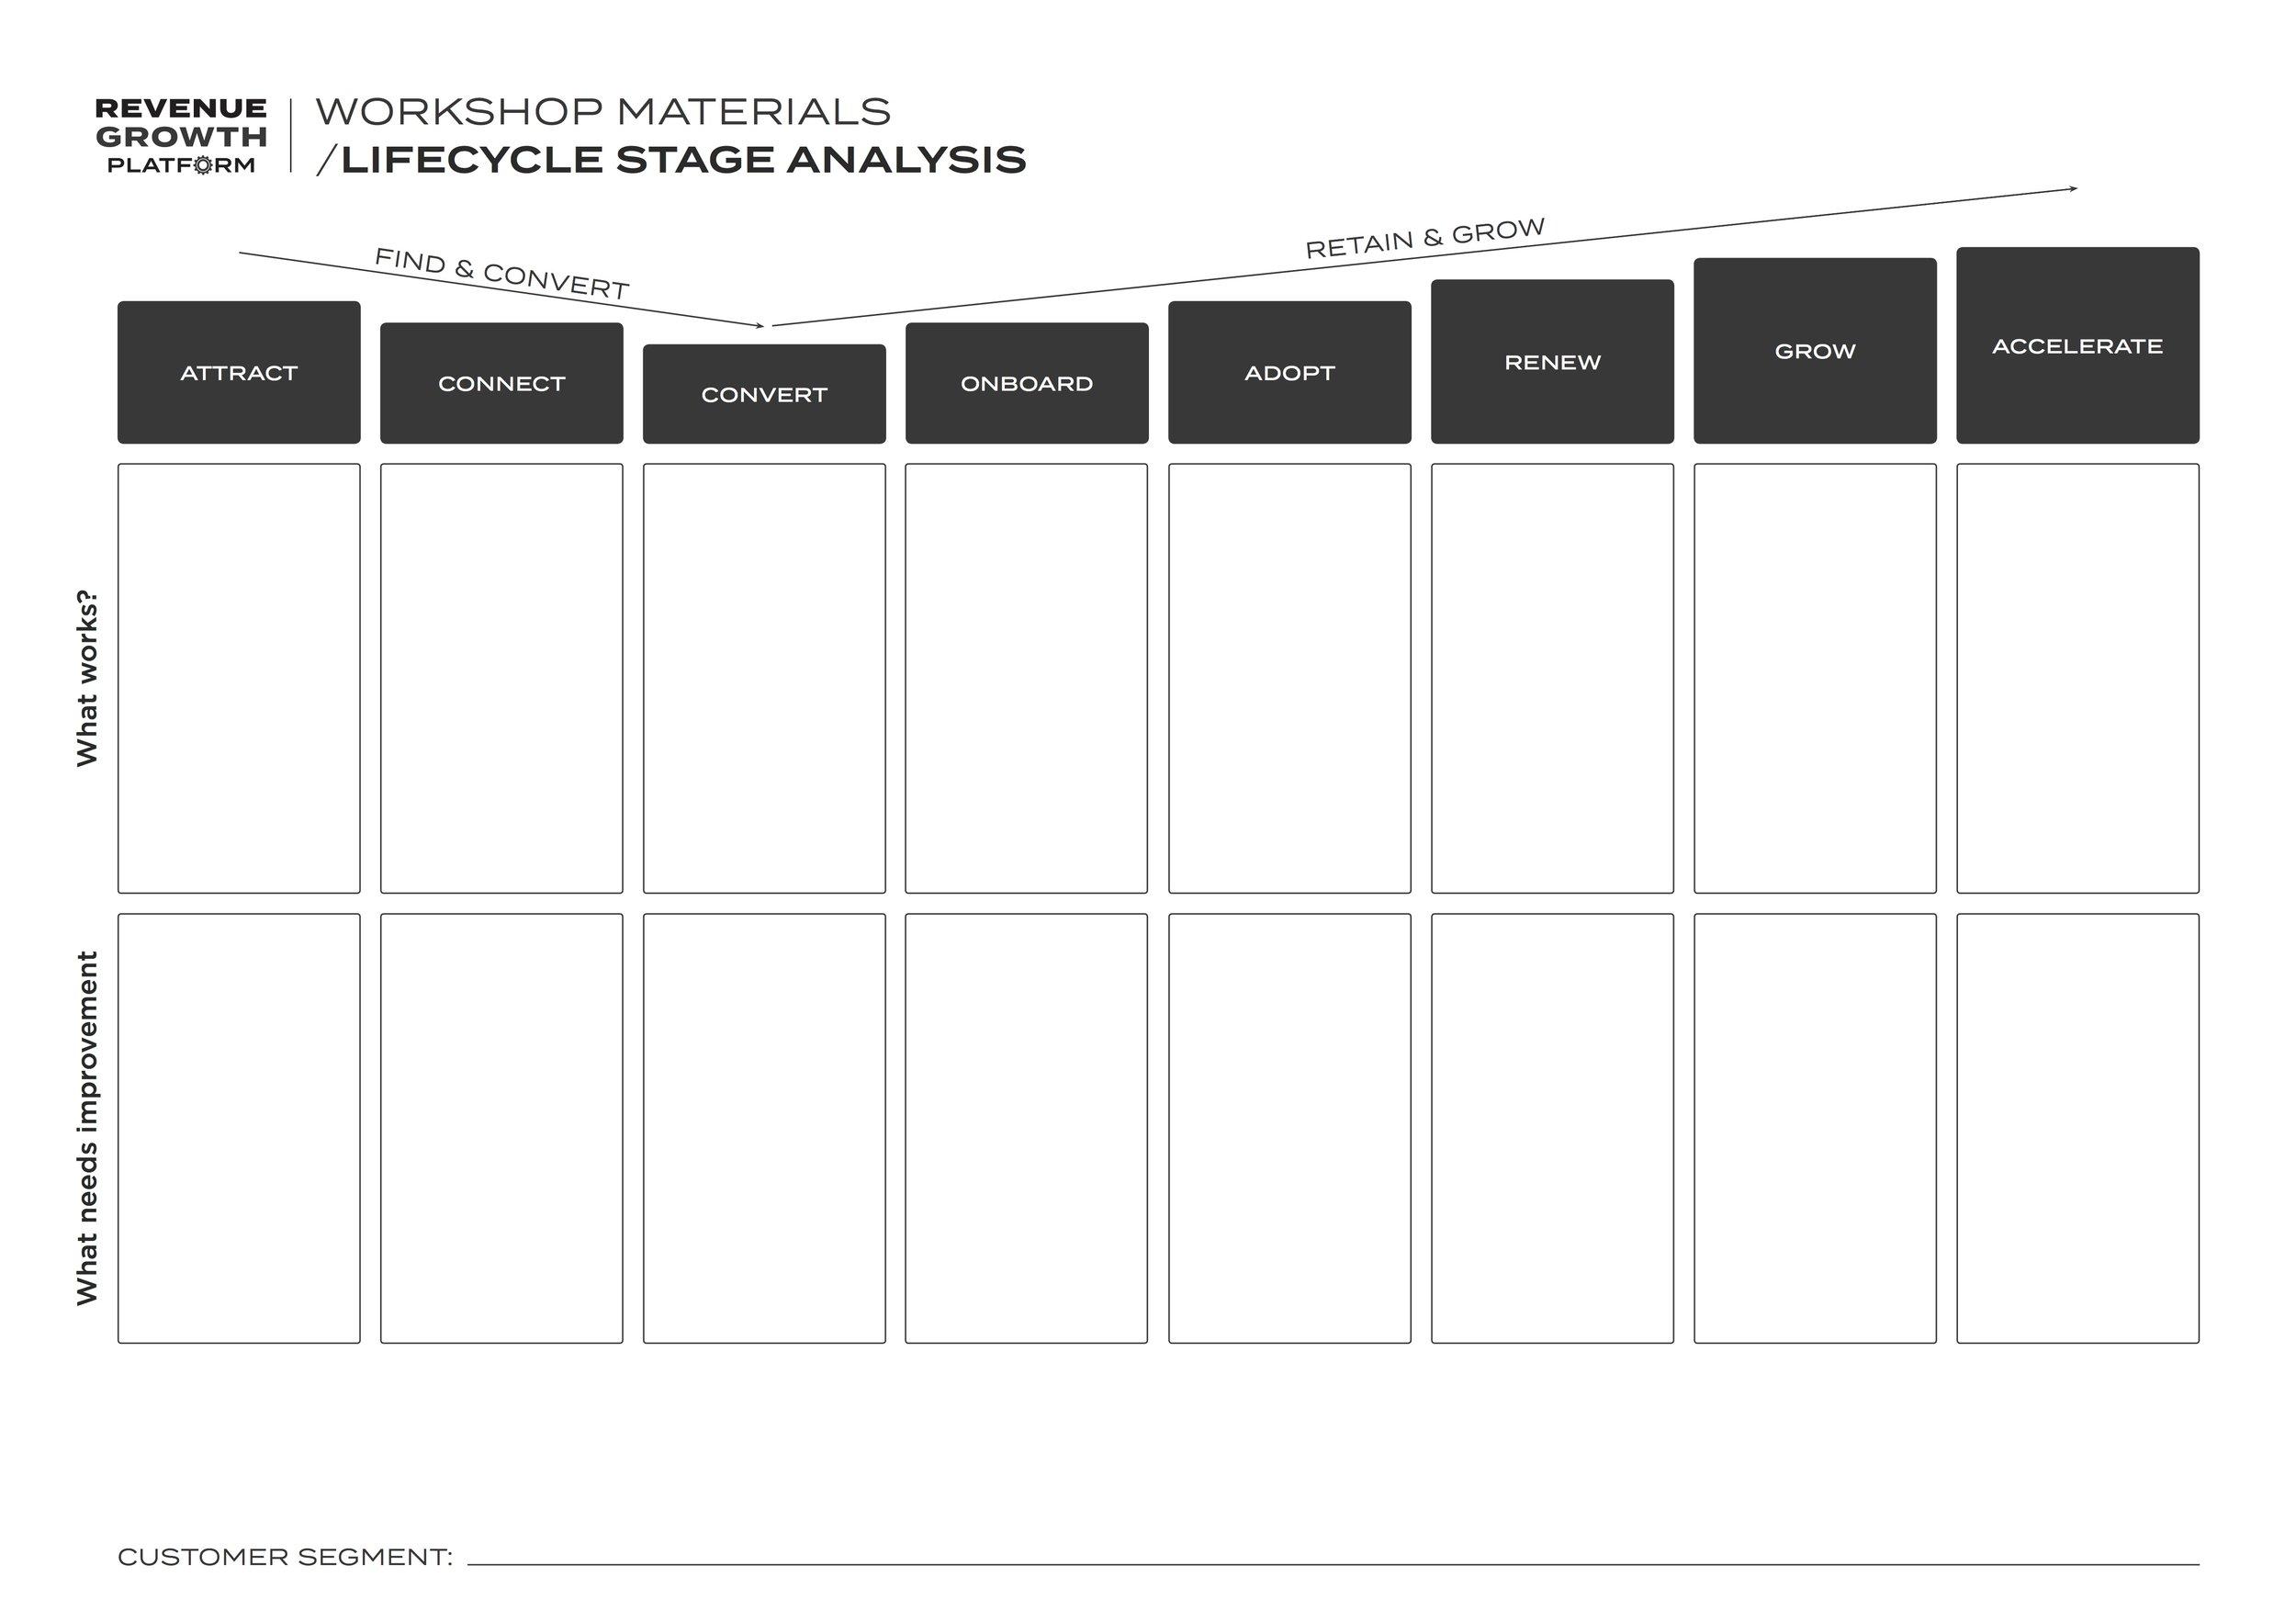 workshop-lifecycle-stage-analysis.jpg